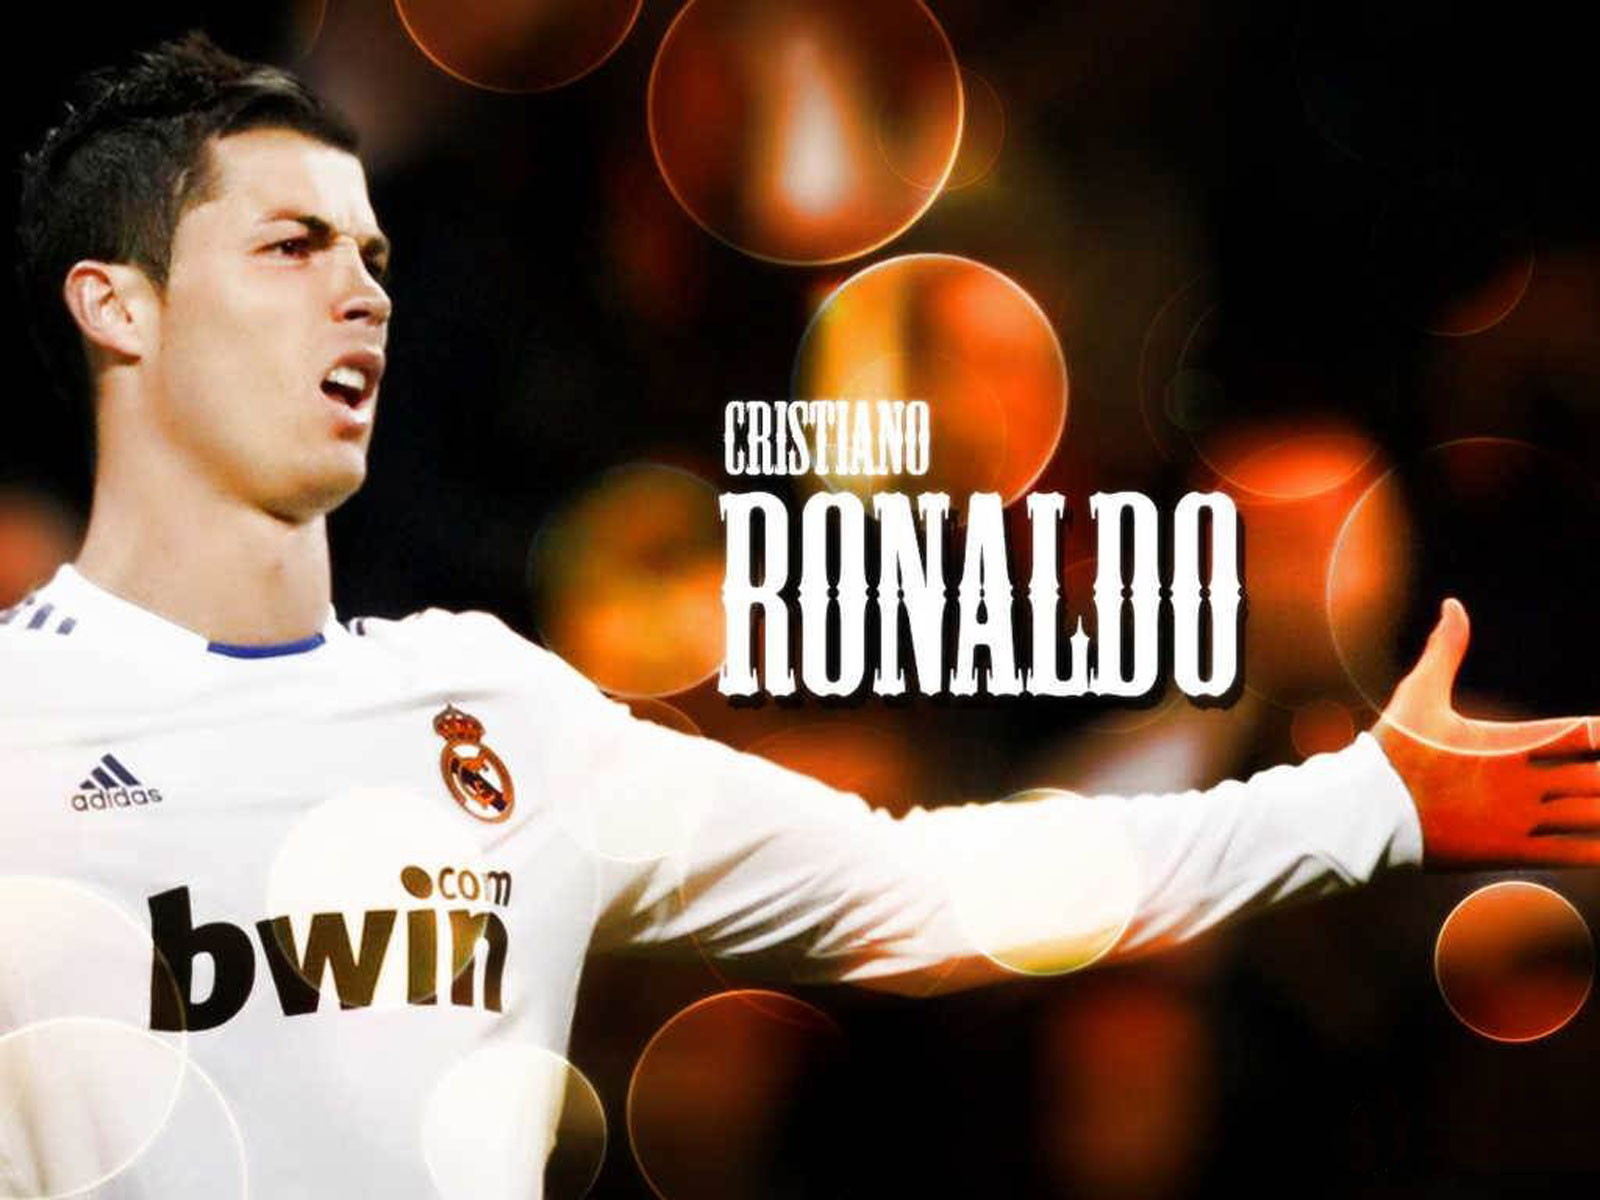 http://1.bp.blogspot.com/-RHaeHmYUZpE/UGQbnQYnXiI/AAAAAAAAHJc/E7Xw6r3Lcr8/s1600/Cristiano-Ronaldo-2012-wallpaper-10.jpg